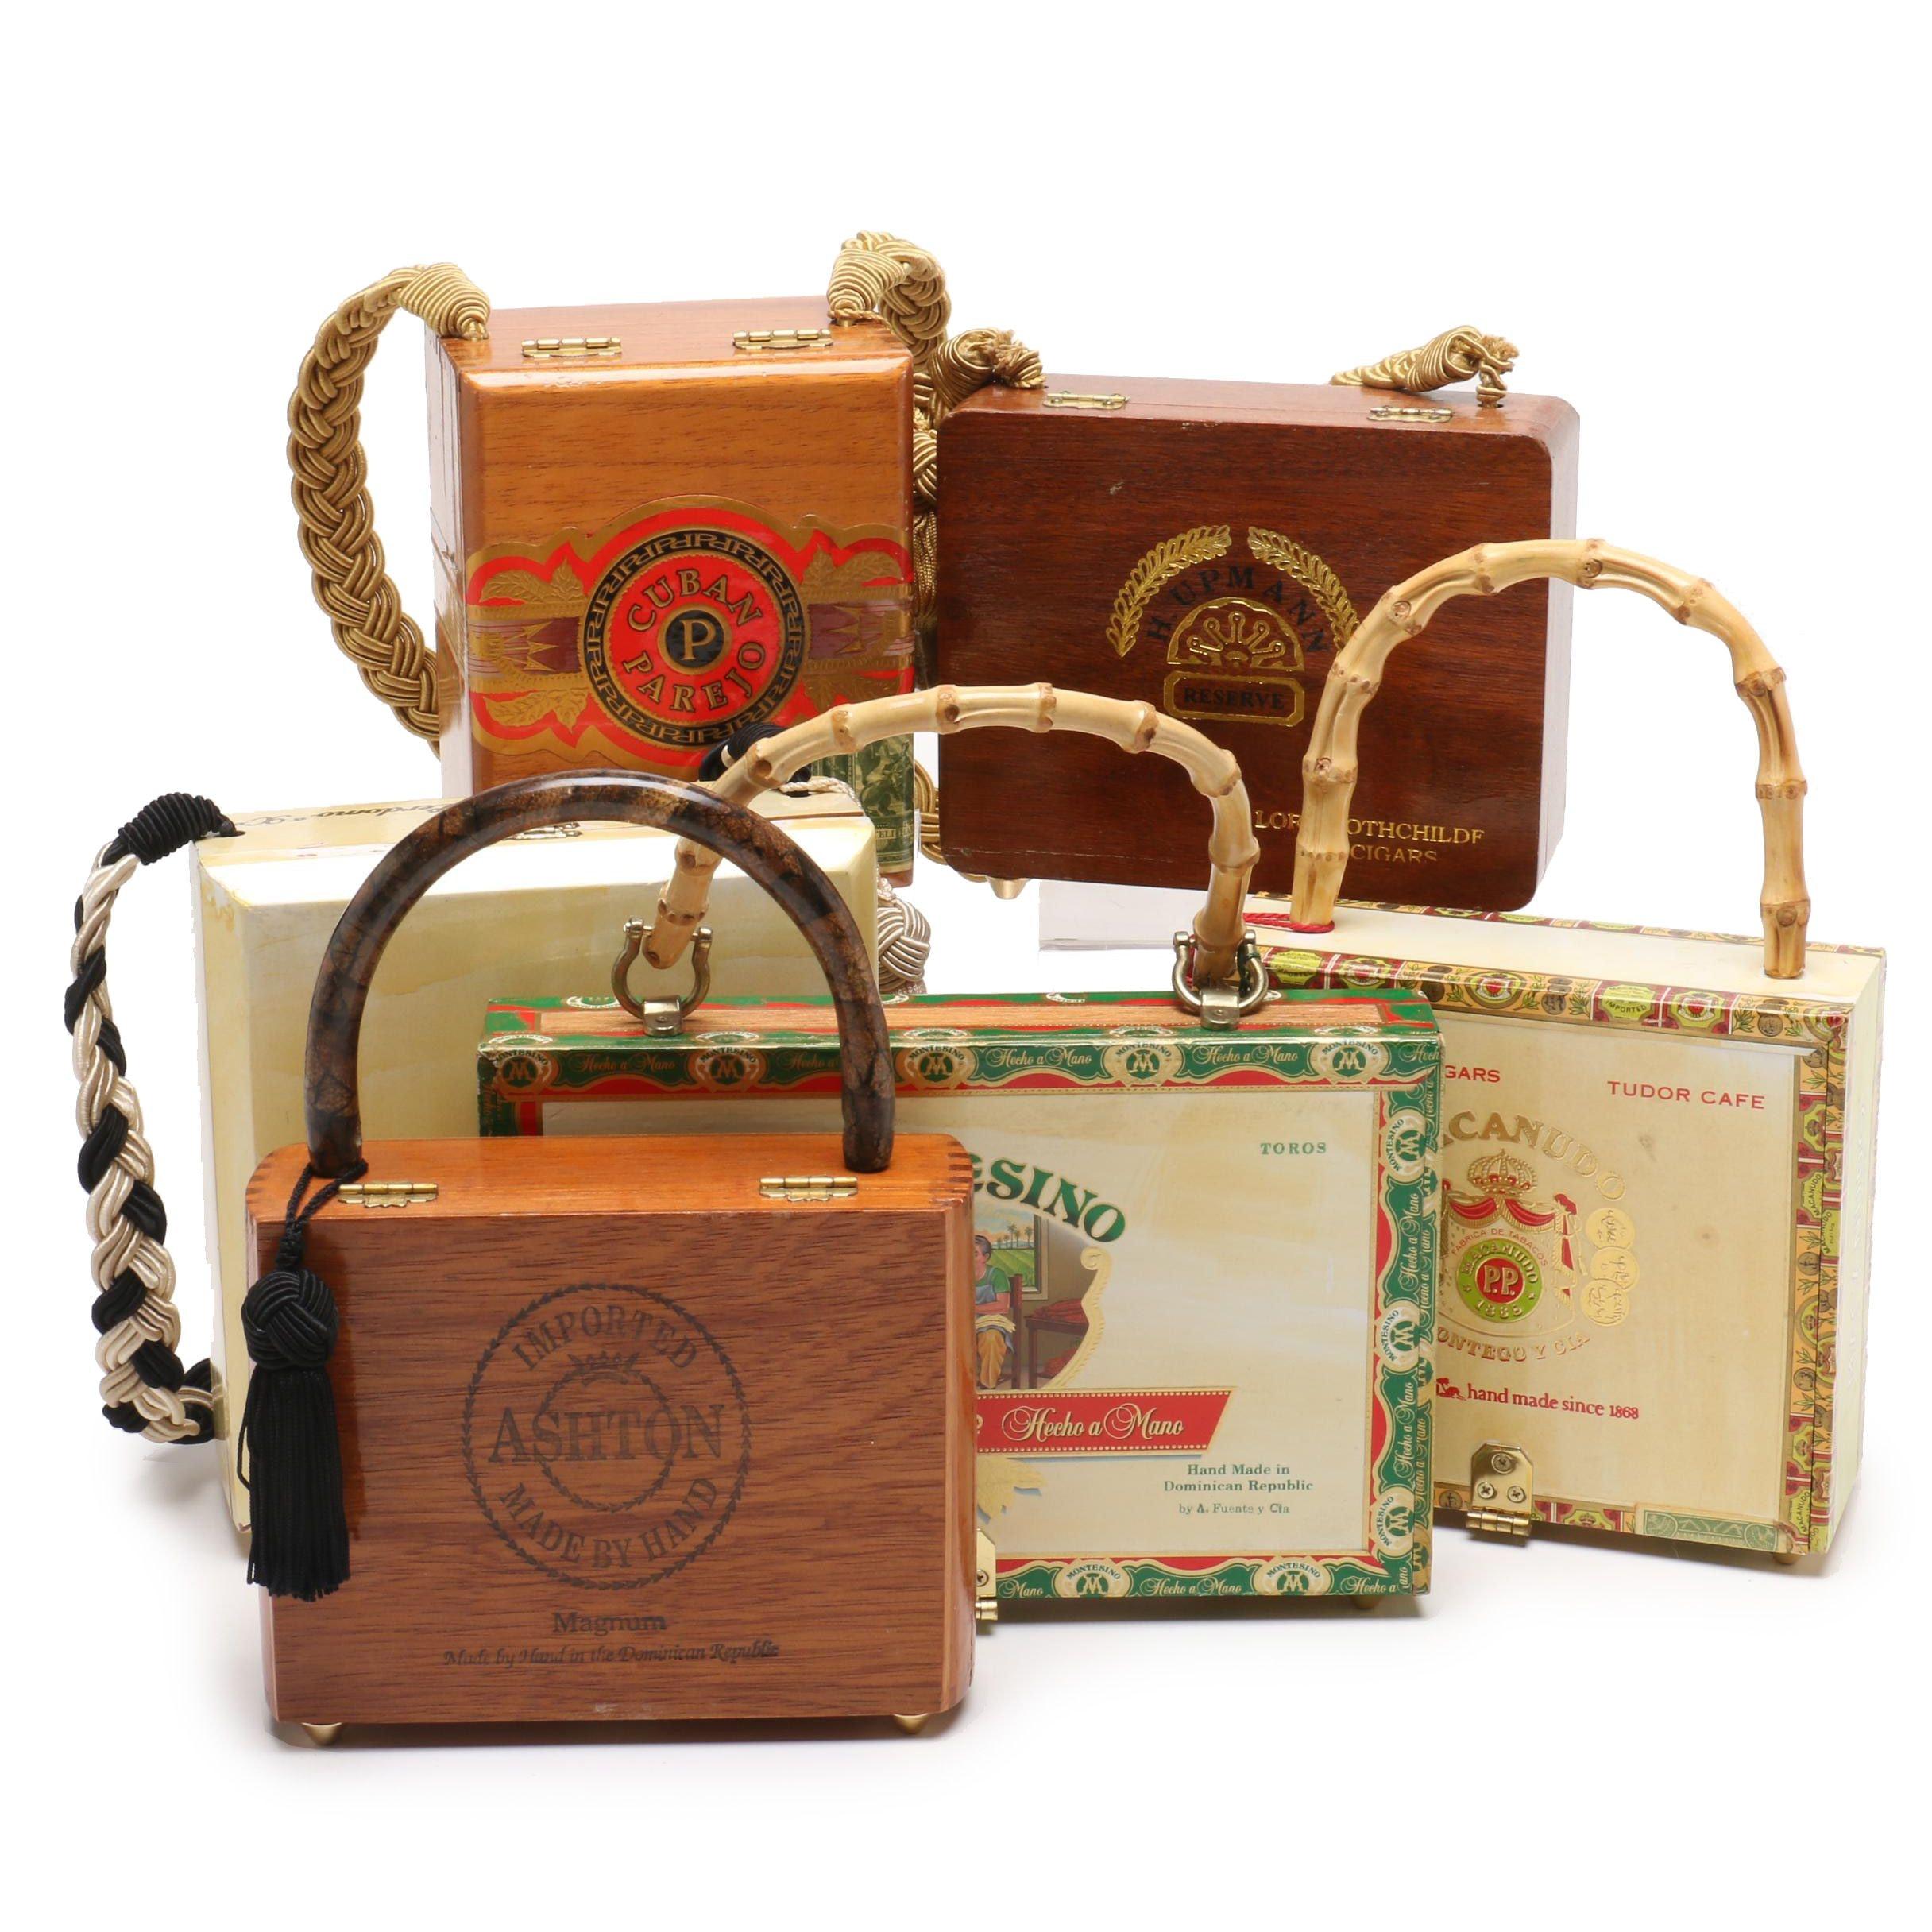 Macanudo Cigar Box Purse and Other Cigar Box Purses, Late 20th Century